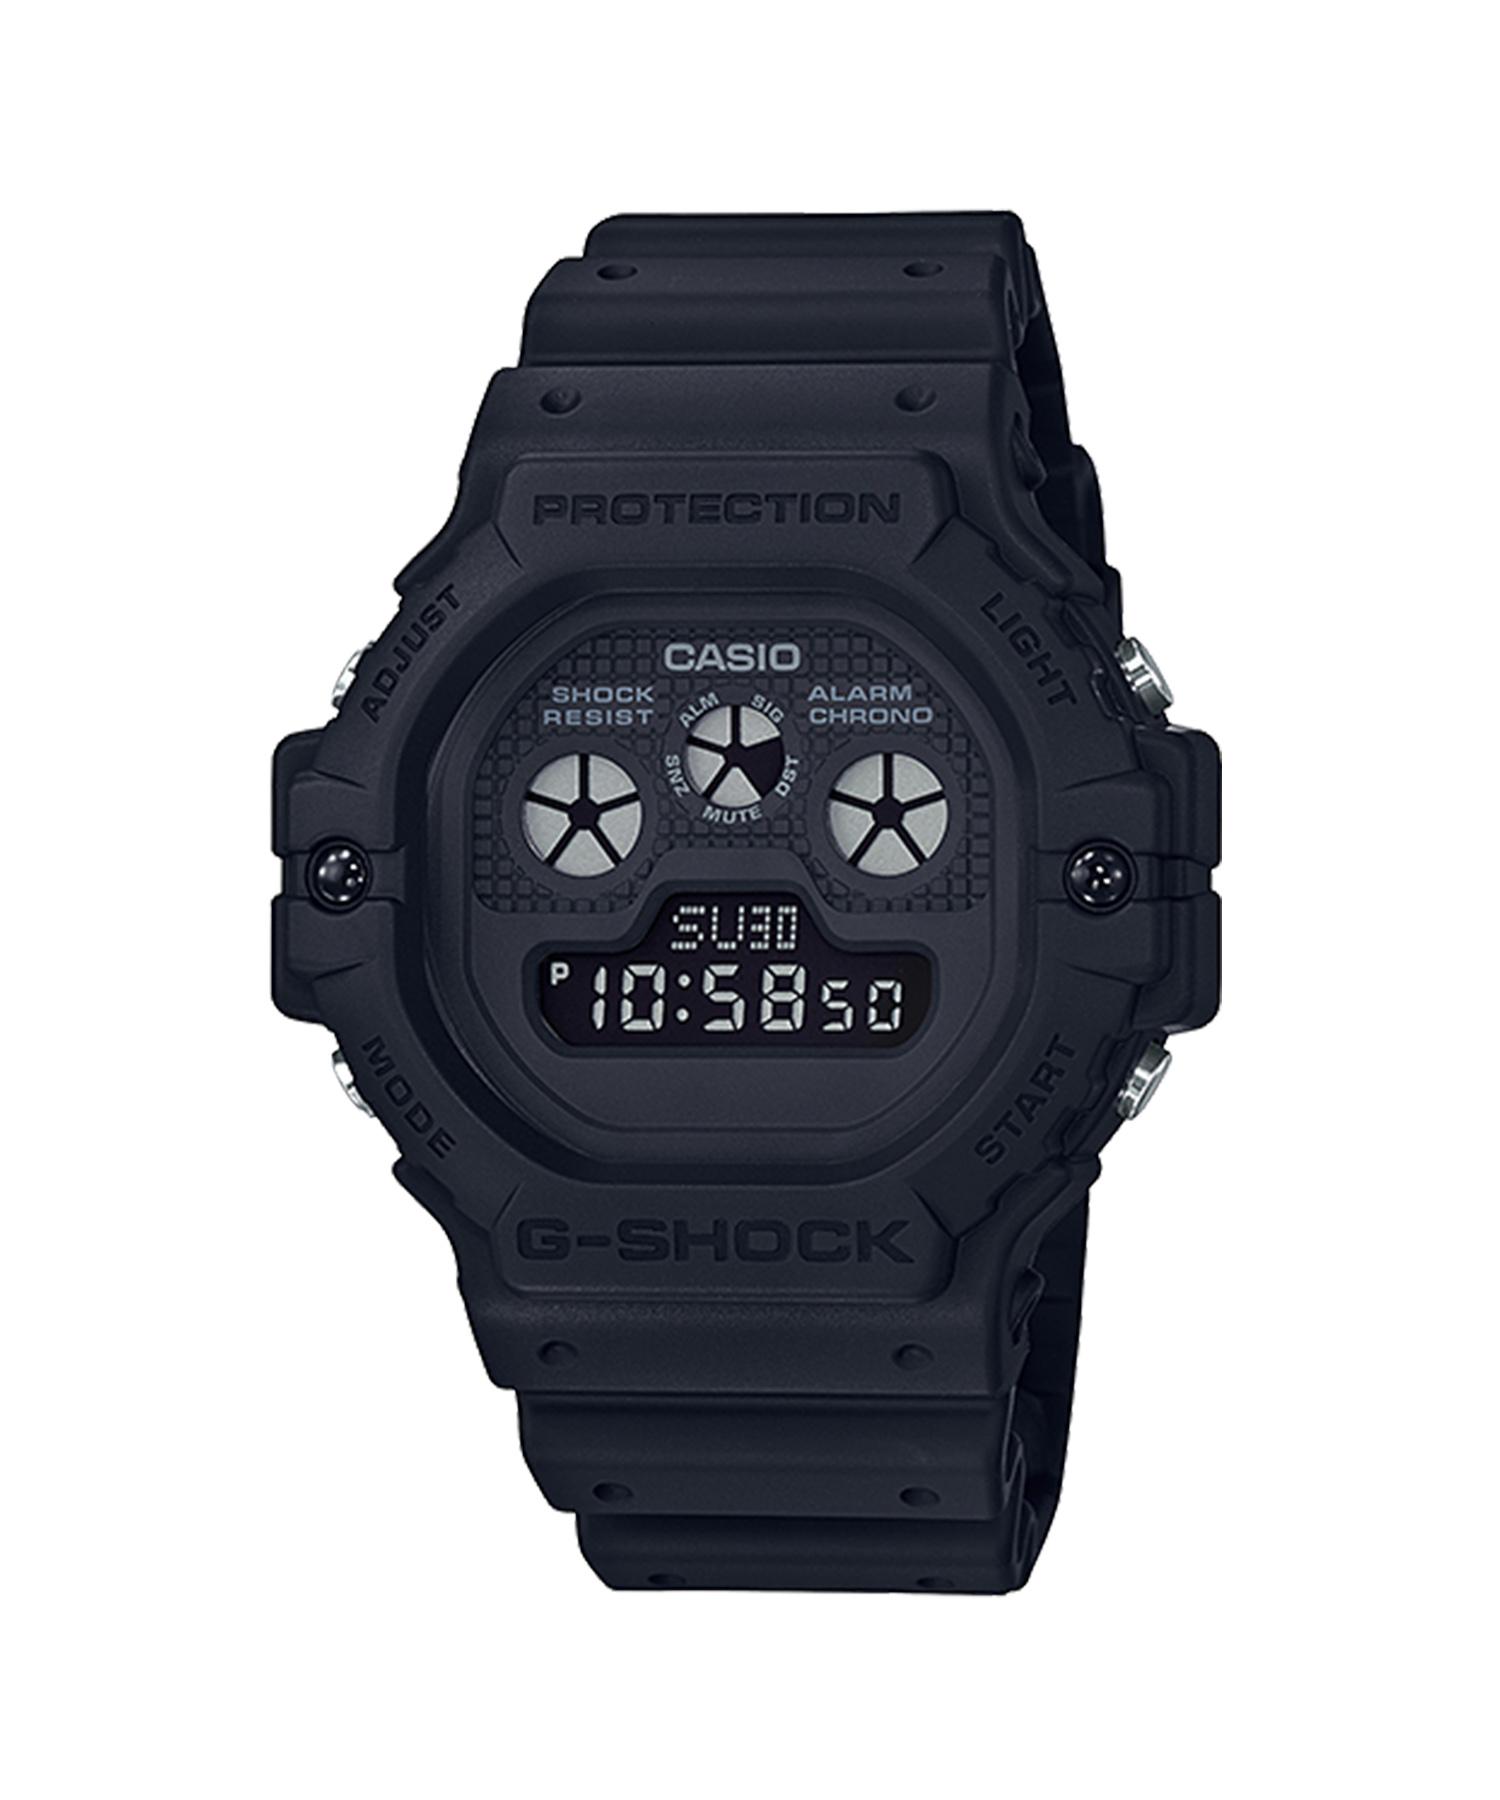 CASIO G-SHOCK DW 5900BB 1FJ